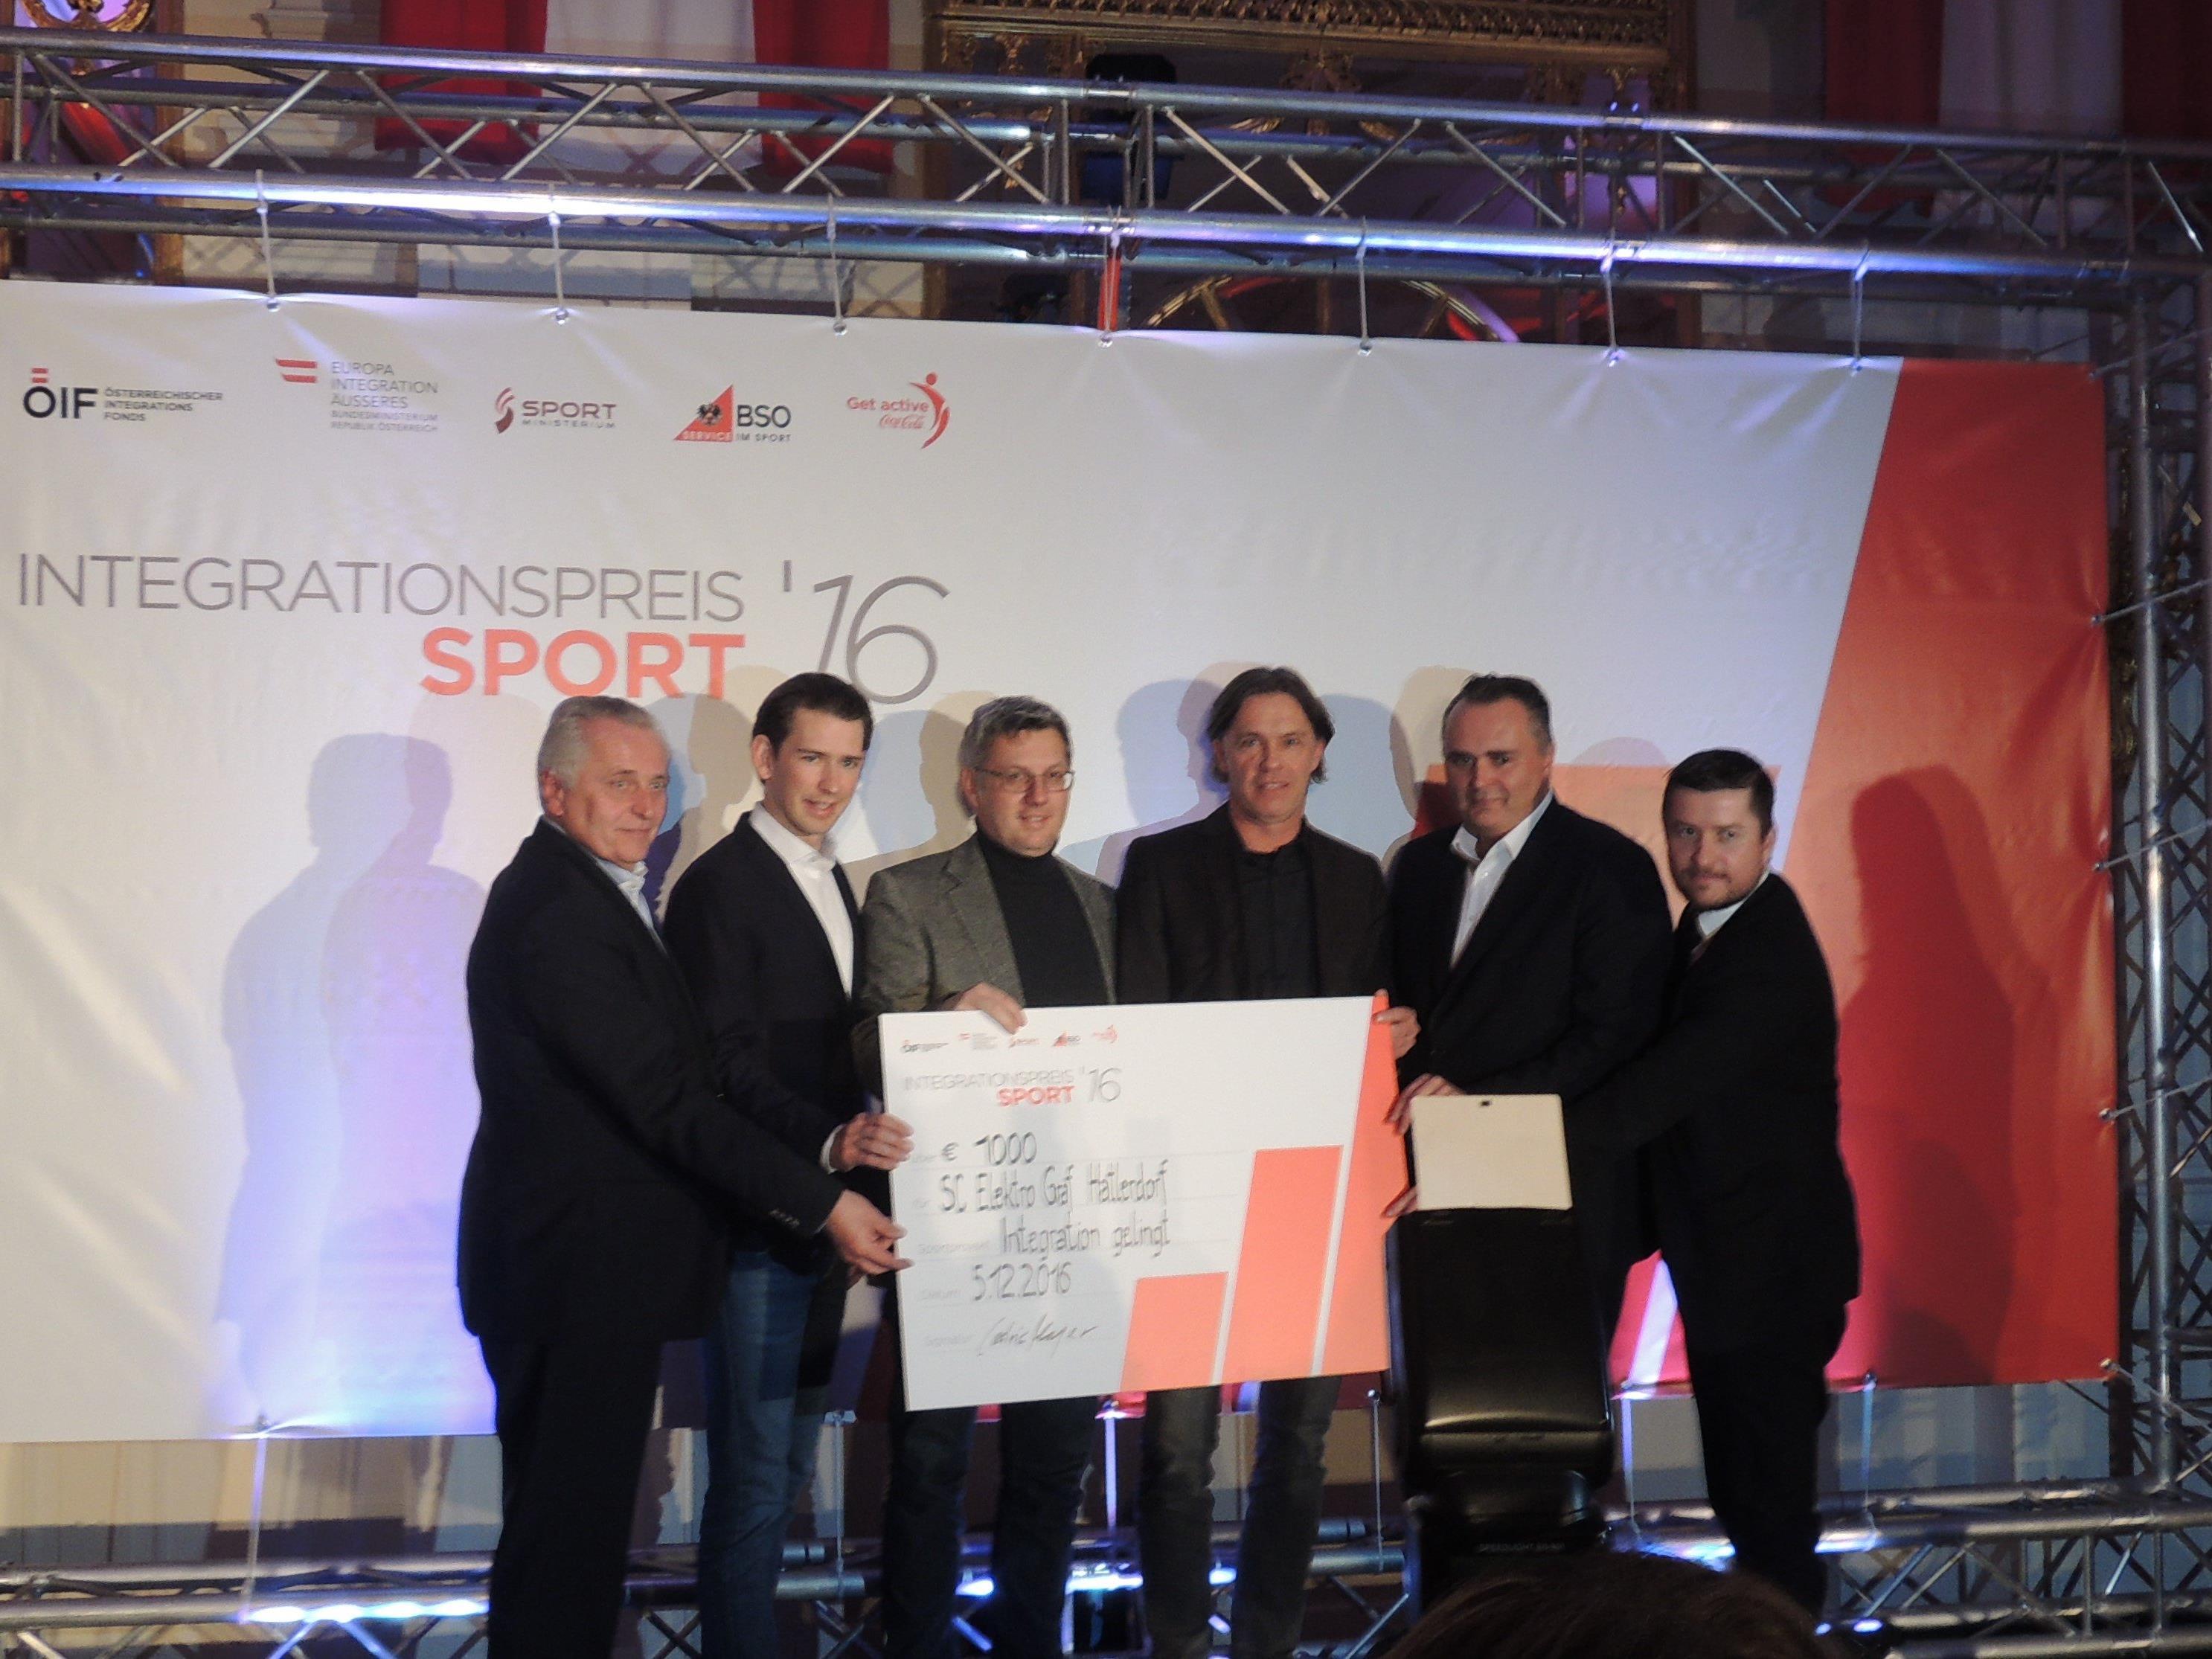 SC Hatlerdorf erhielt den Integrationspreis 2016